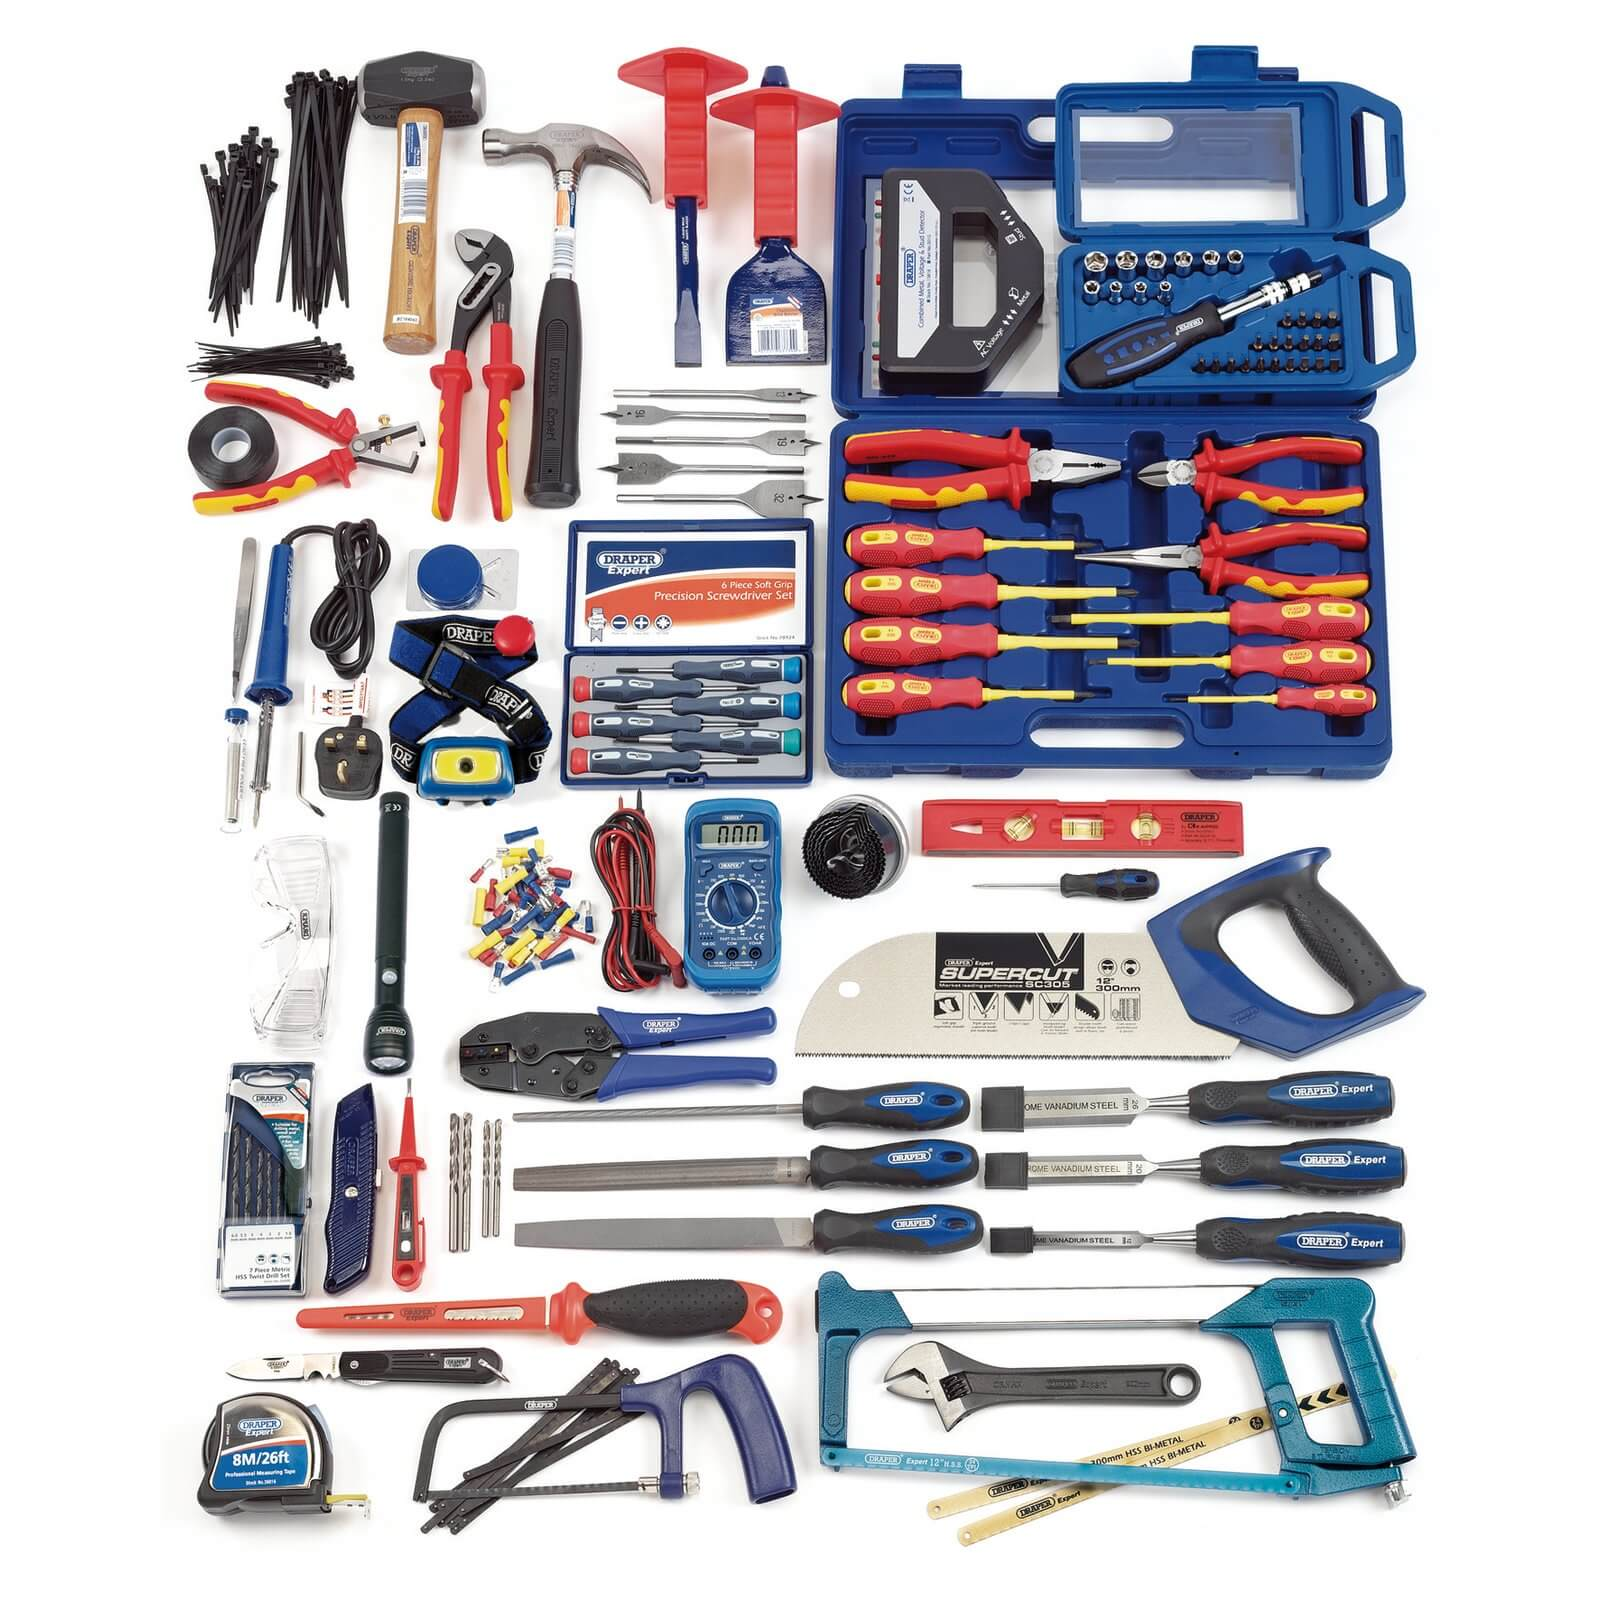 Image of Draper 235 Piece Electricians Tool & Accessory Set